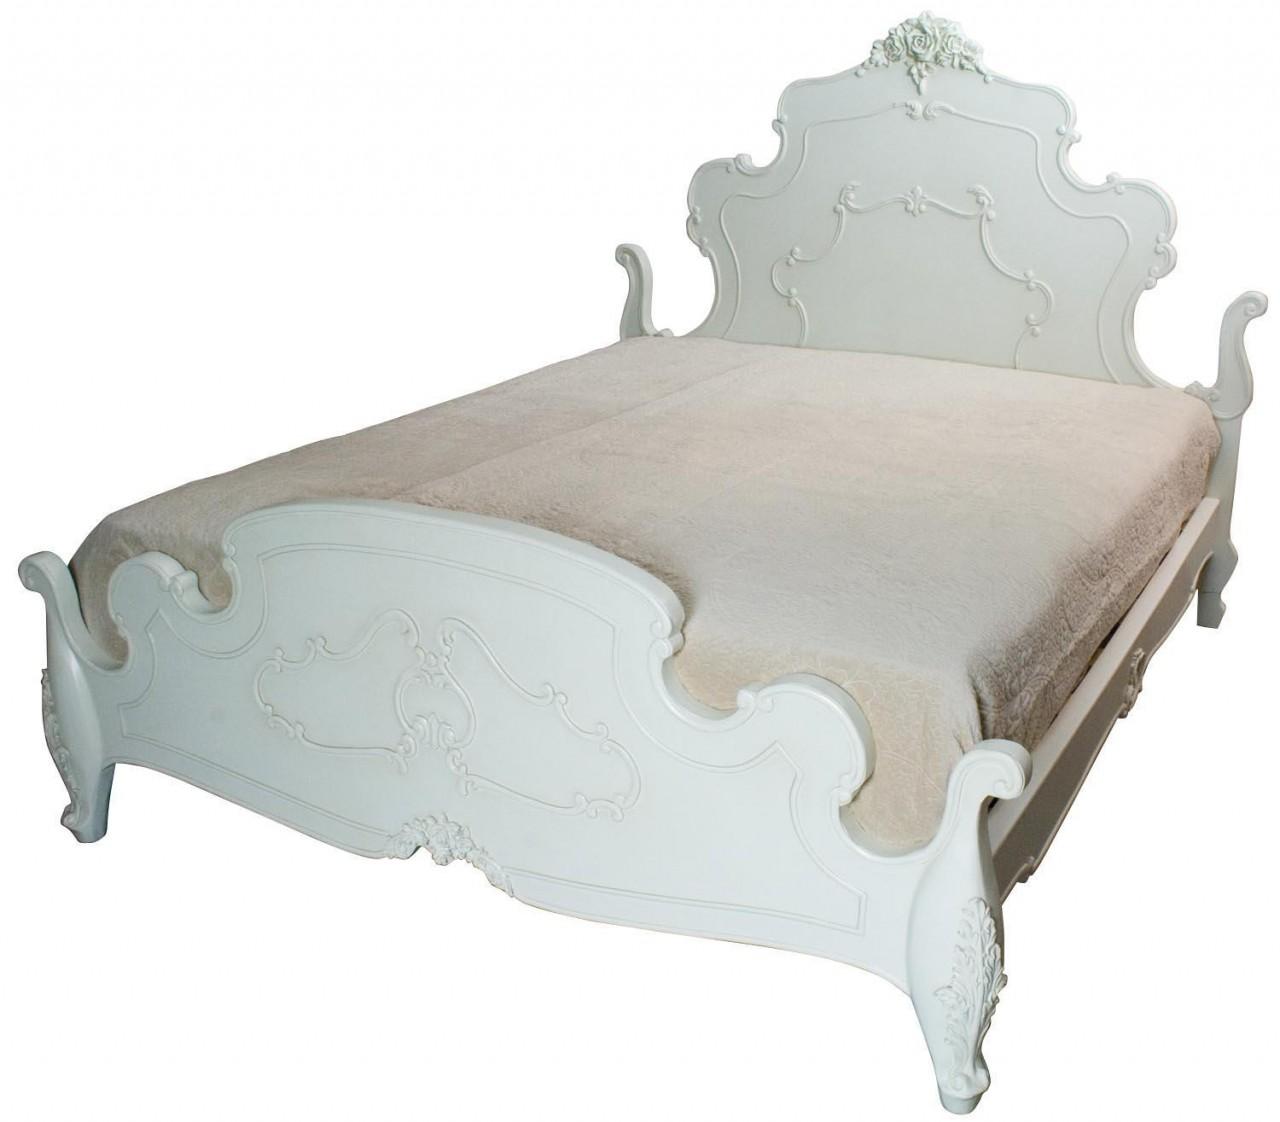 Rose Range - Ivory King Size Bed